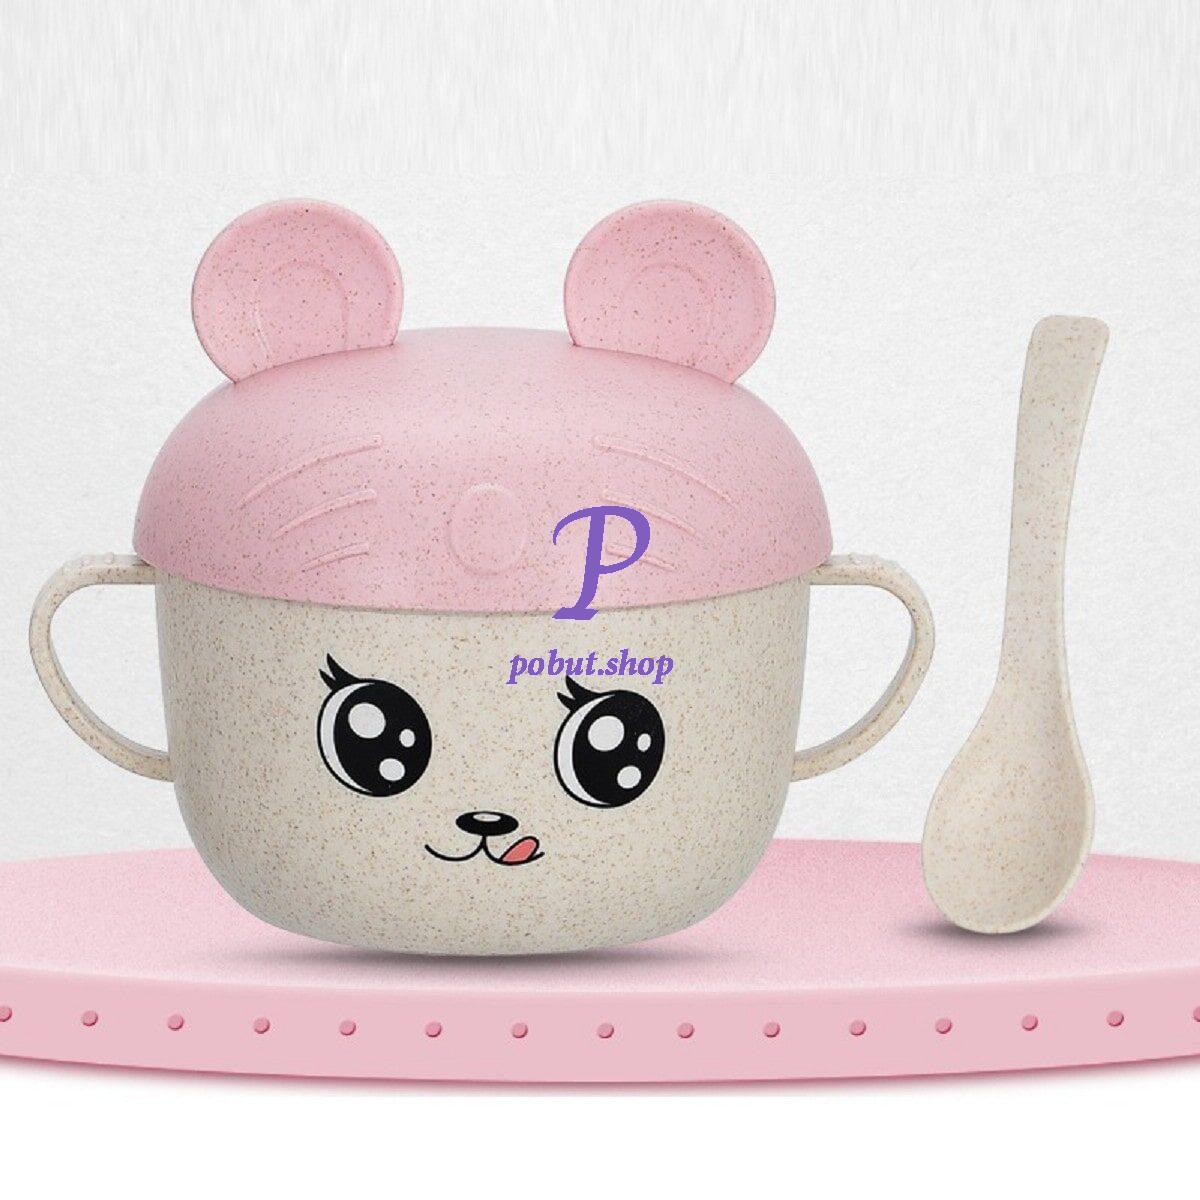 Дитяча еко чашка з кришкою-вушками 450 мл, рожева